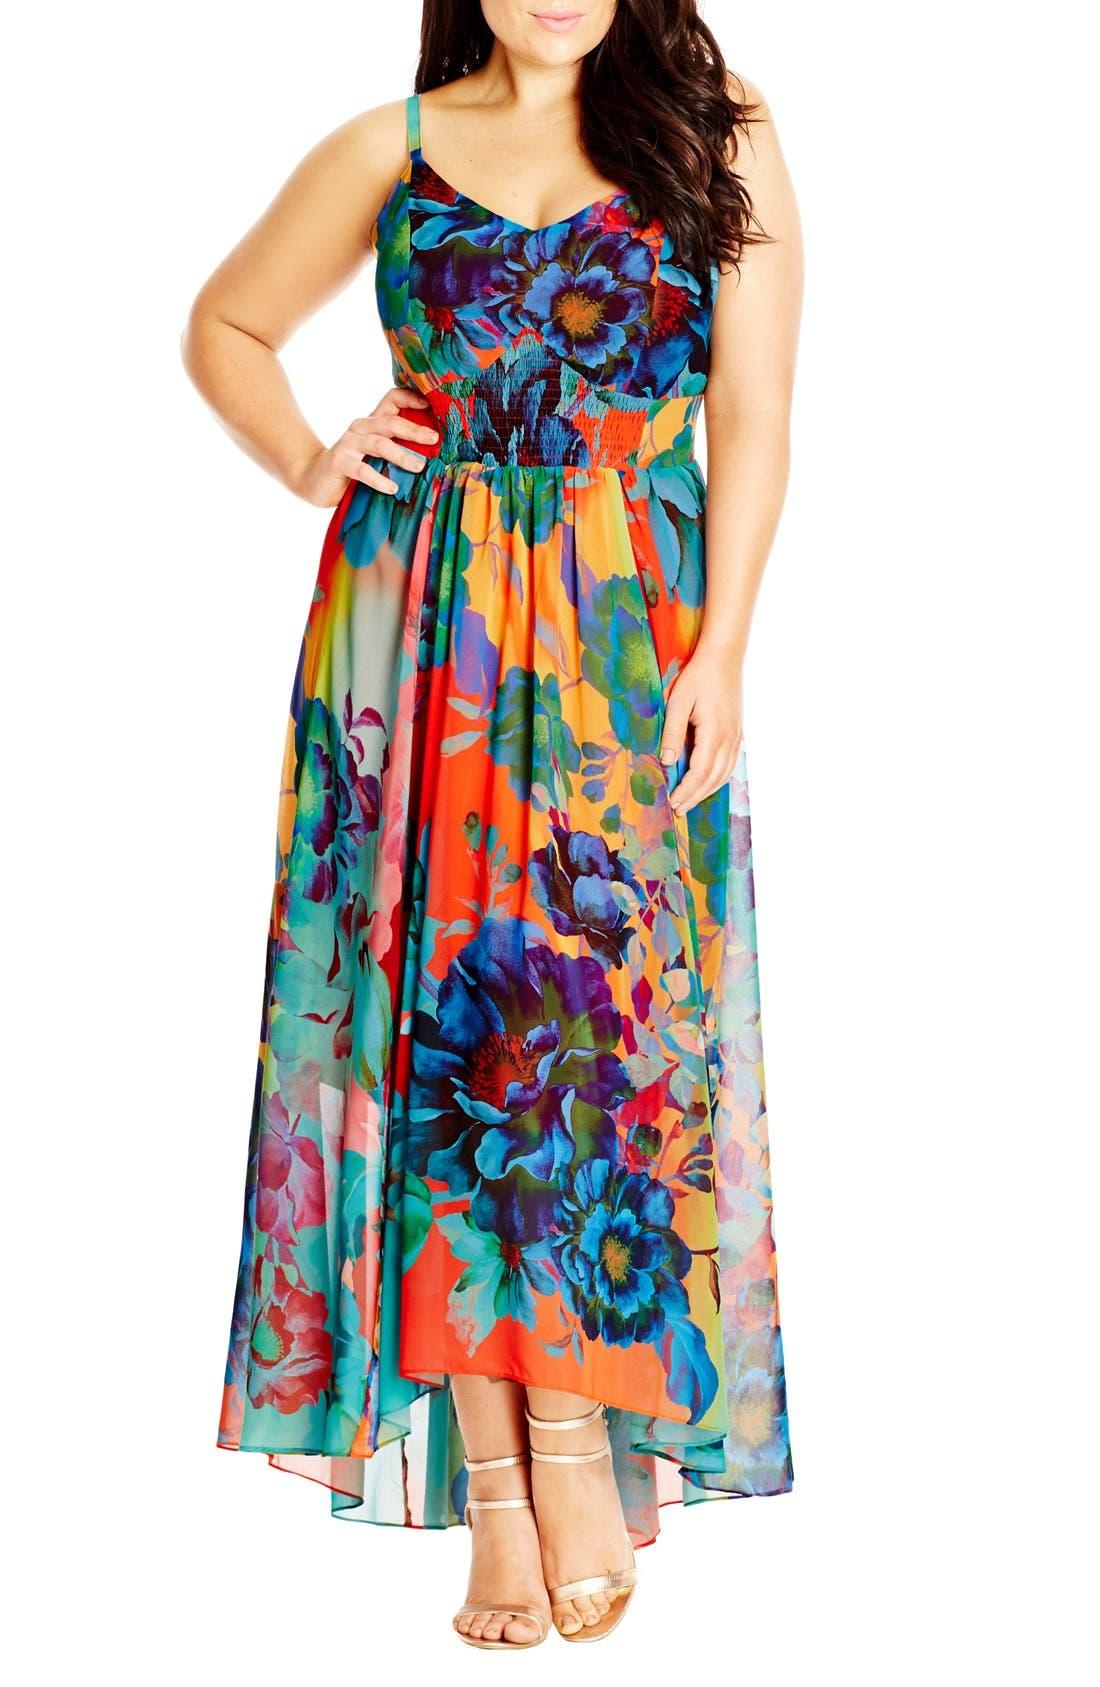 CITY CHIC, 'Hot Summer Days' Print High/Low Maxi Dress, Main thumbnail 1, color, CORAL